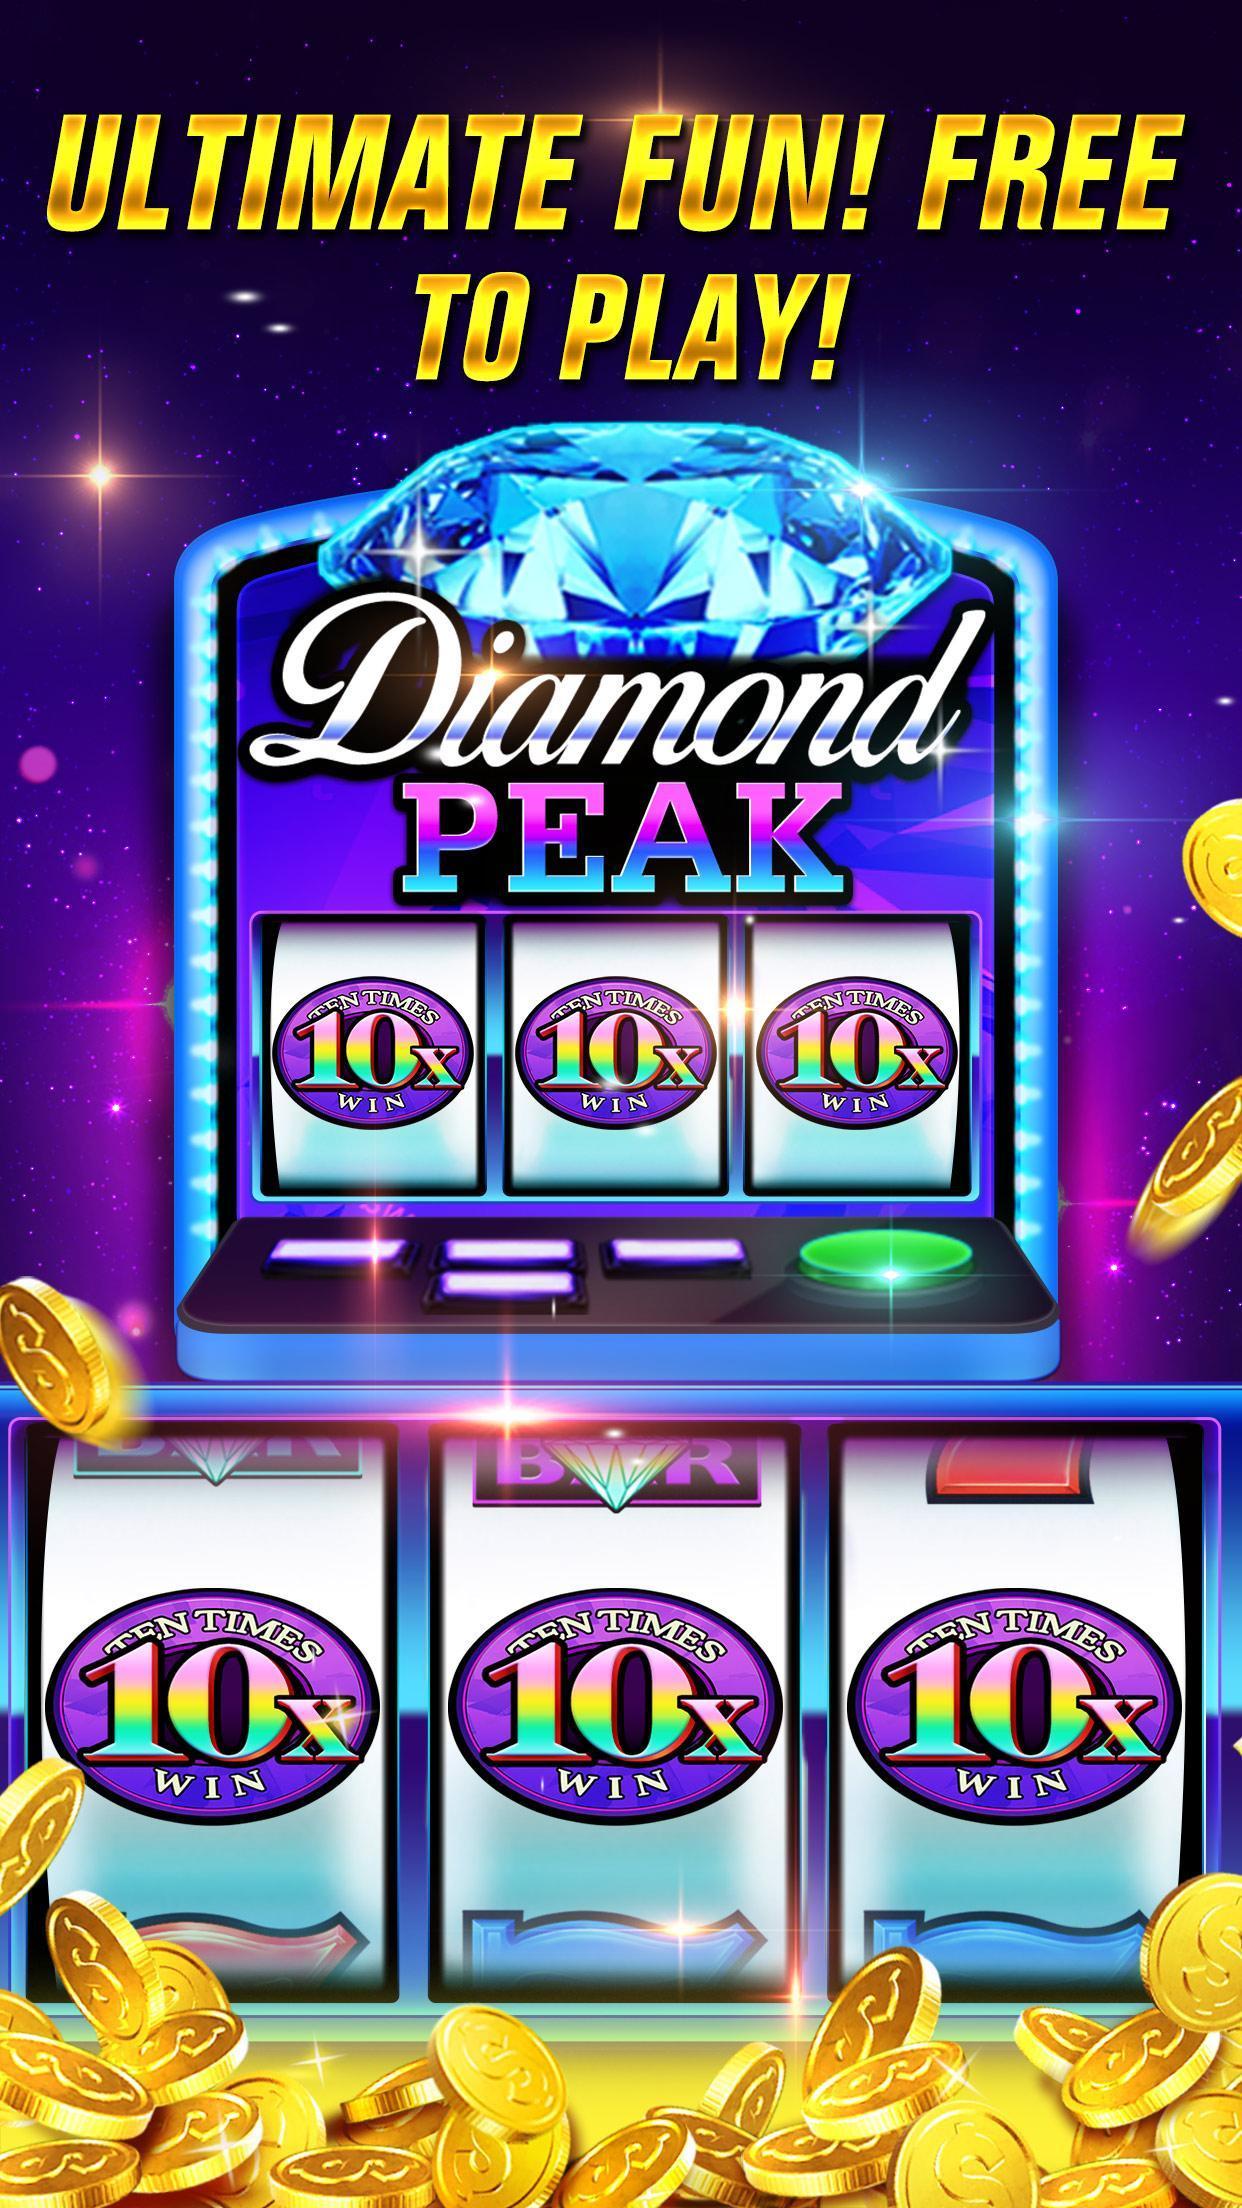 Lucky Draw - 3D Casino Slots 5.0.0 Screenshot 2